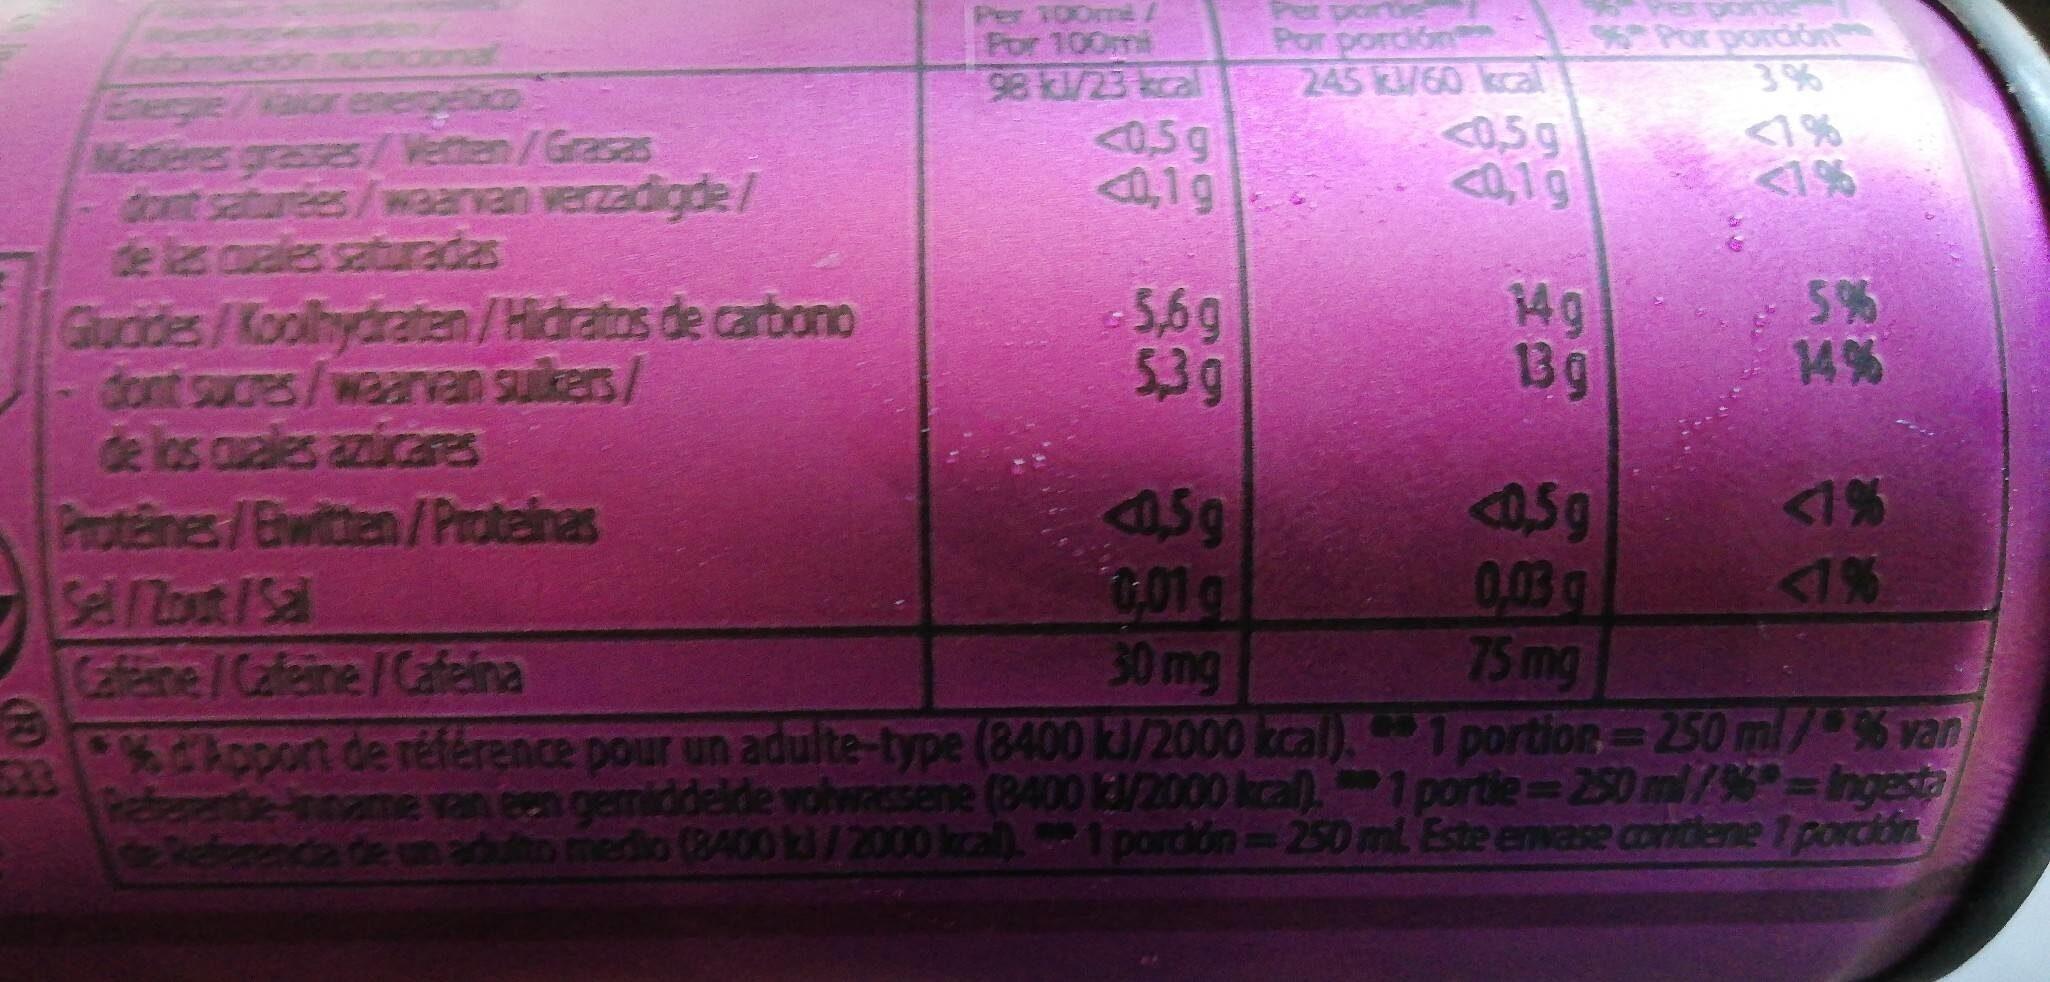 Yula acai berry spice - Valori nutrizionali - en